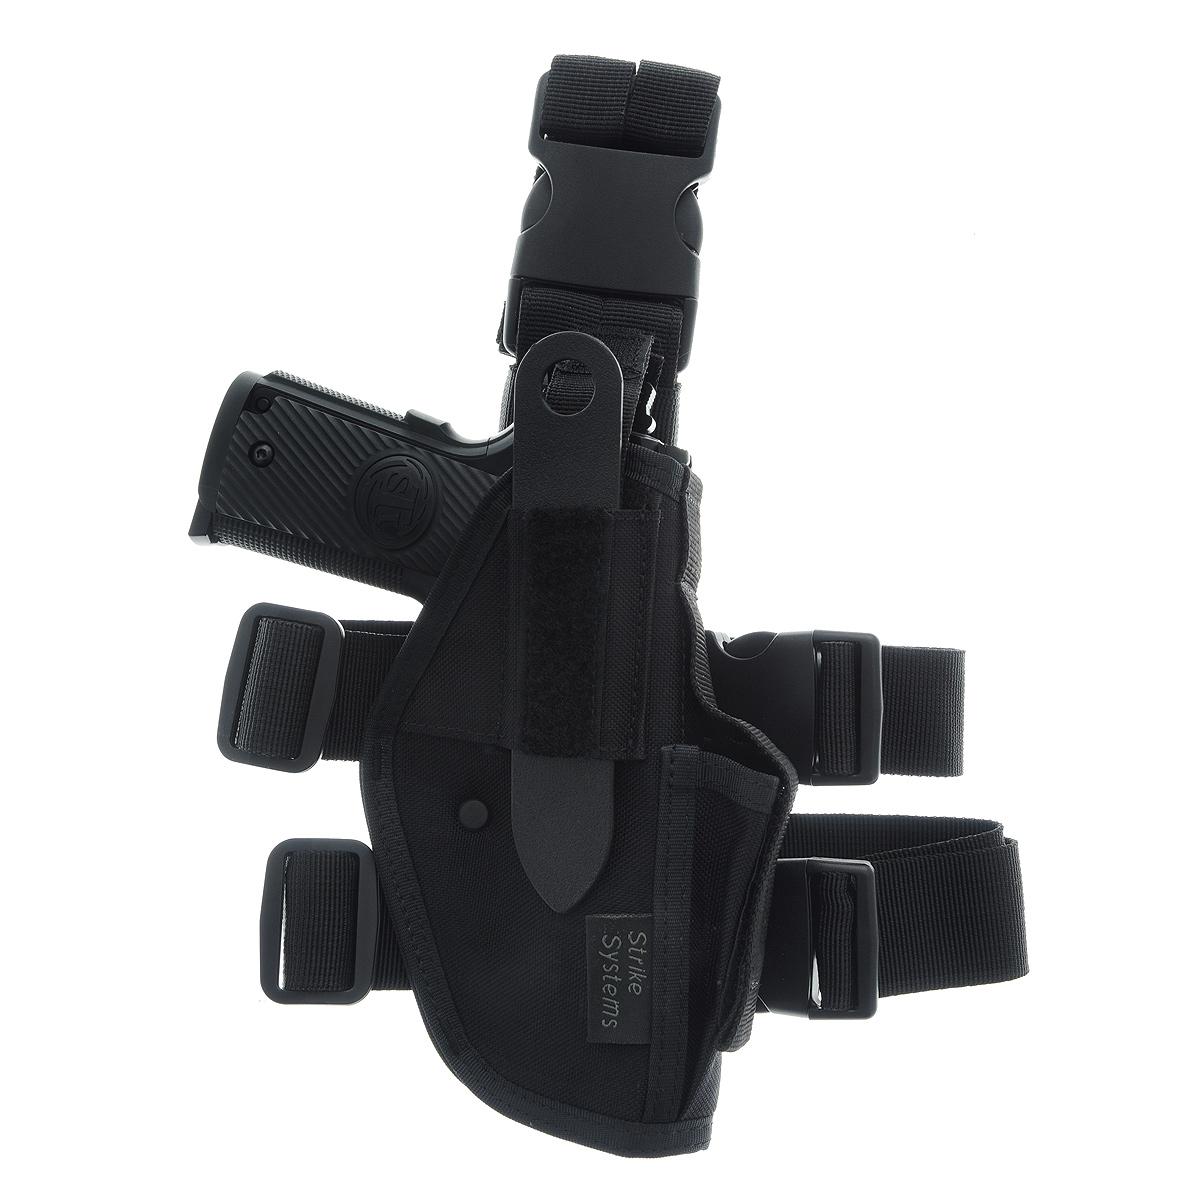 Кобура ASG набедренная для M92, G17/18, STI, CZ, Steyr, Bersa, цвет: Black (11968)